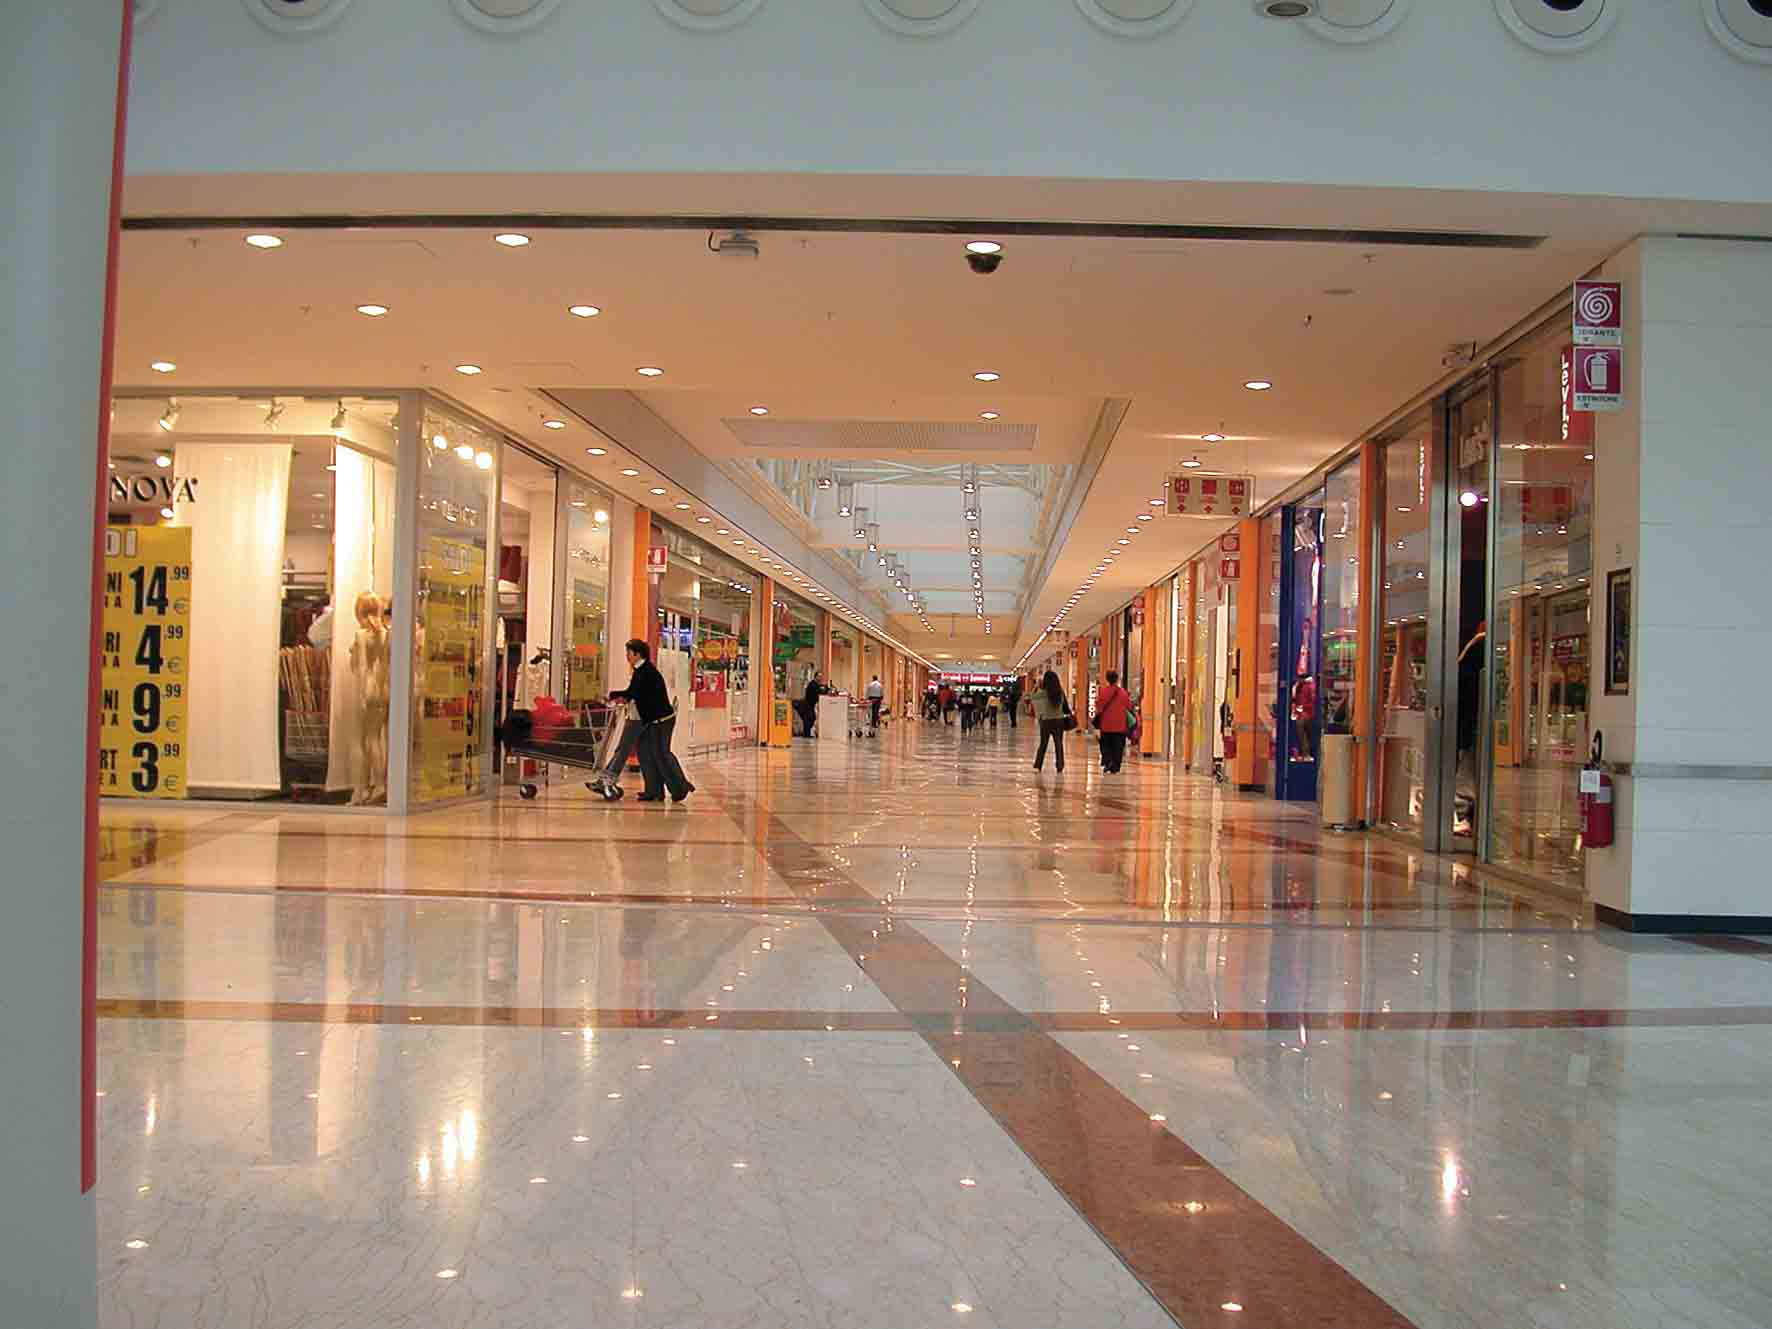 Centro Commerciale Torresina aperto Carnevale domenica 15 febbraio 2015?